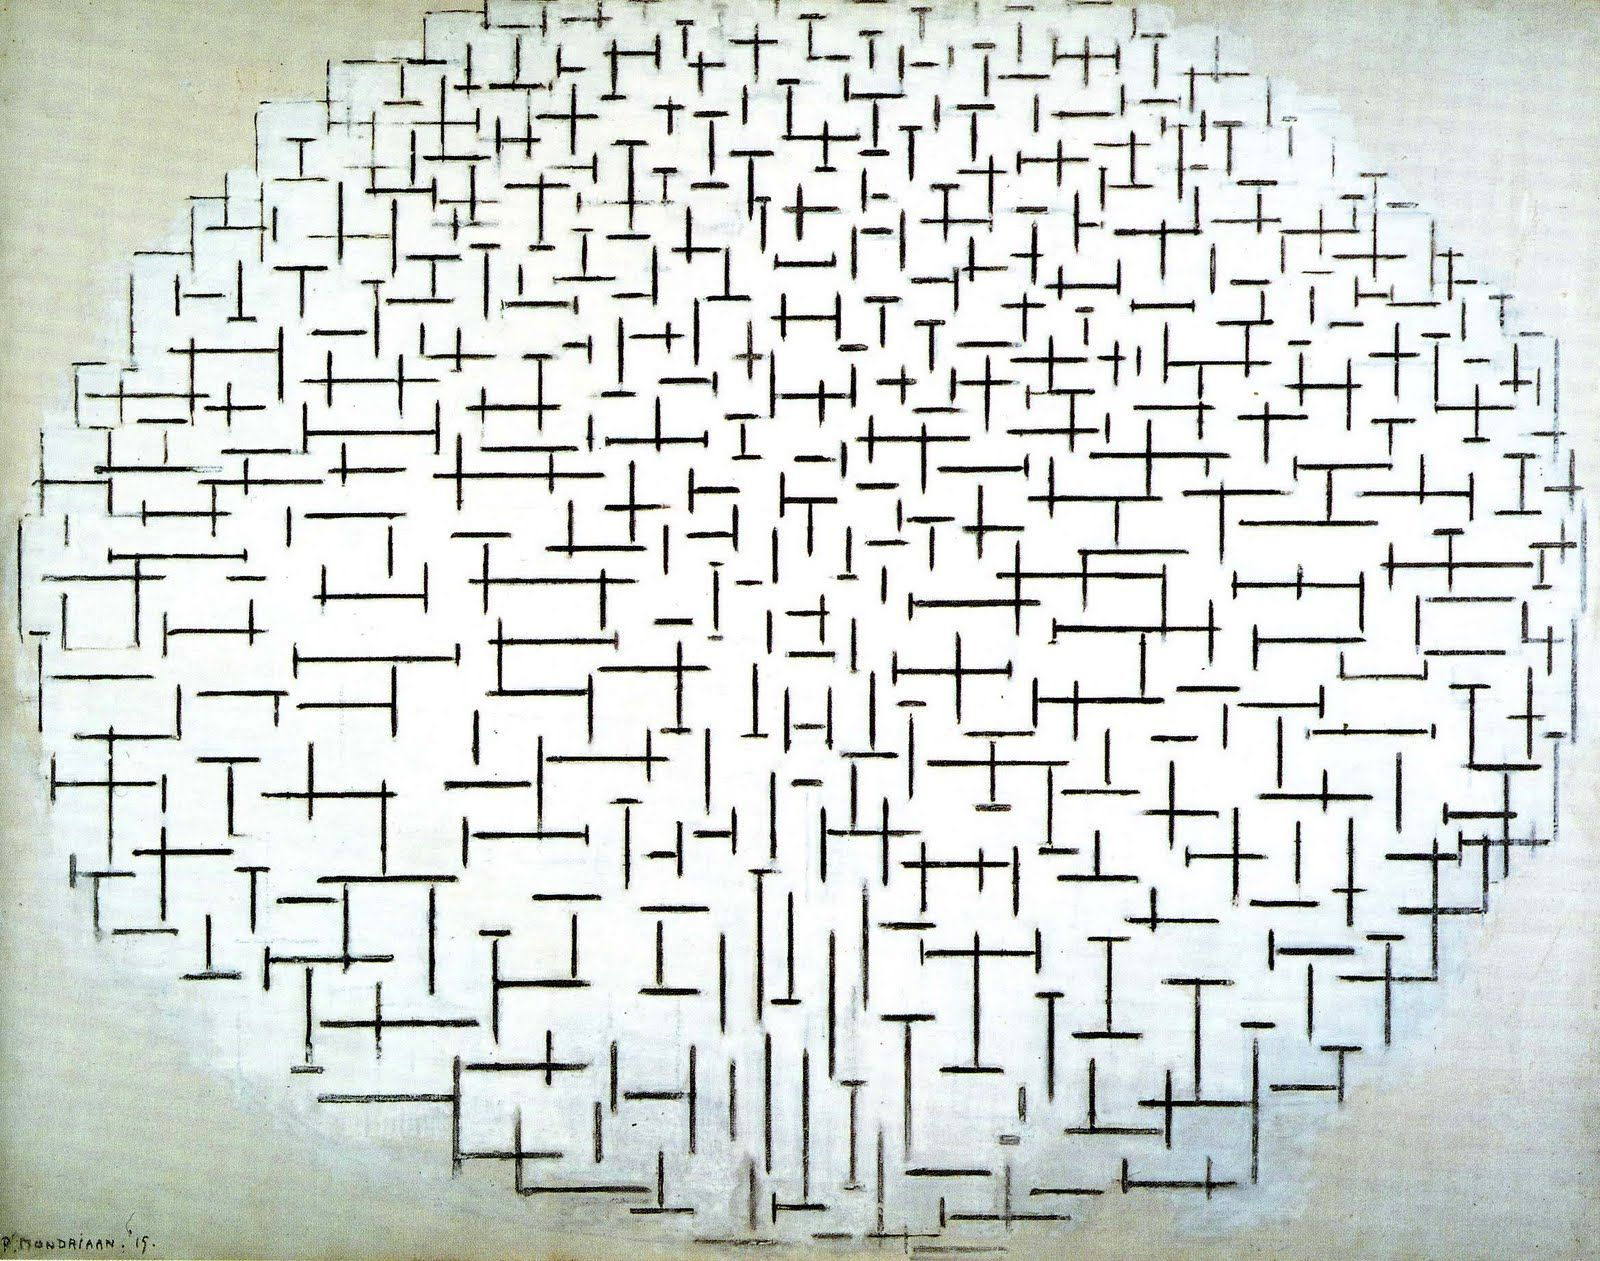 piet mondrian composition in black and white rijksmuseum krllermller